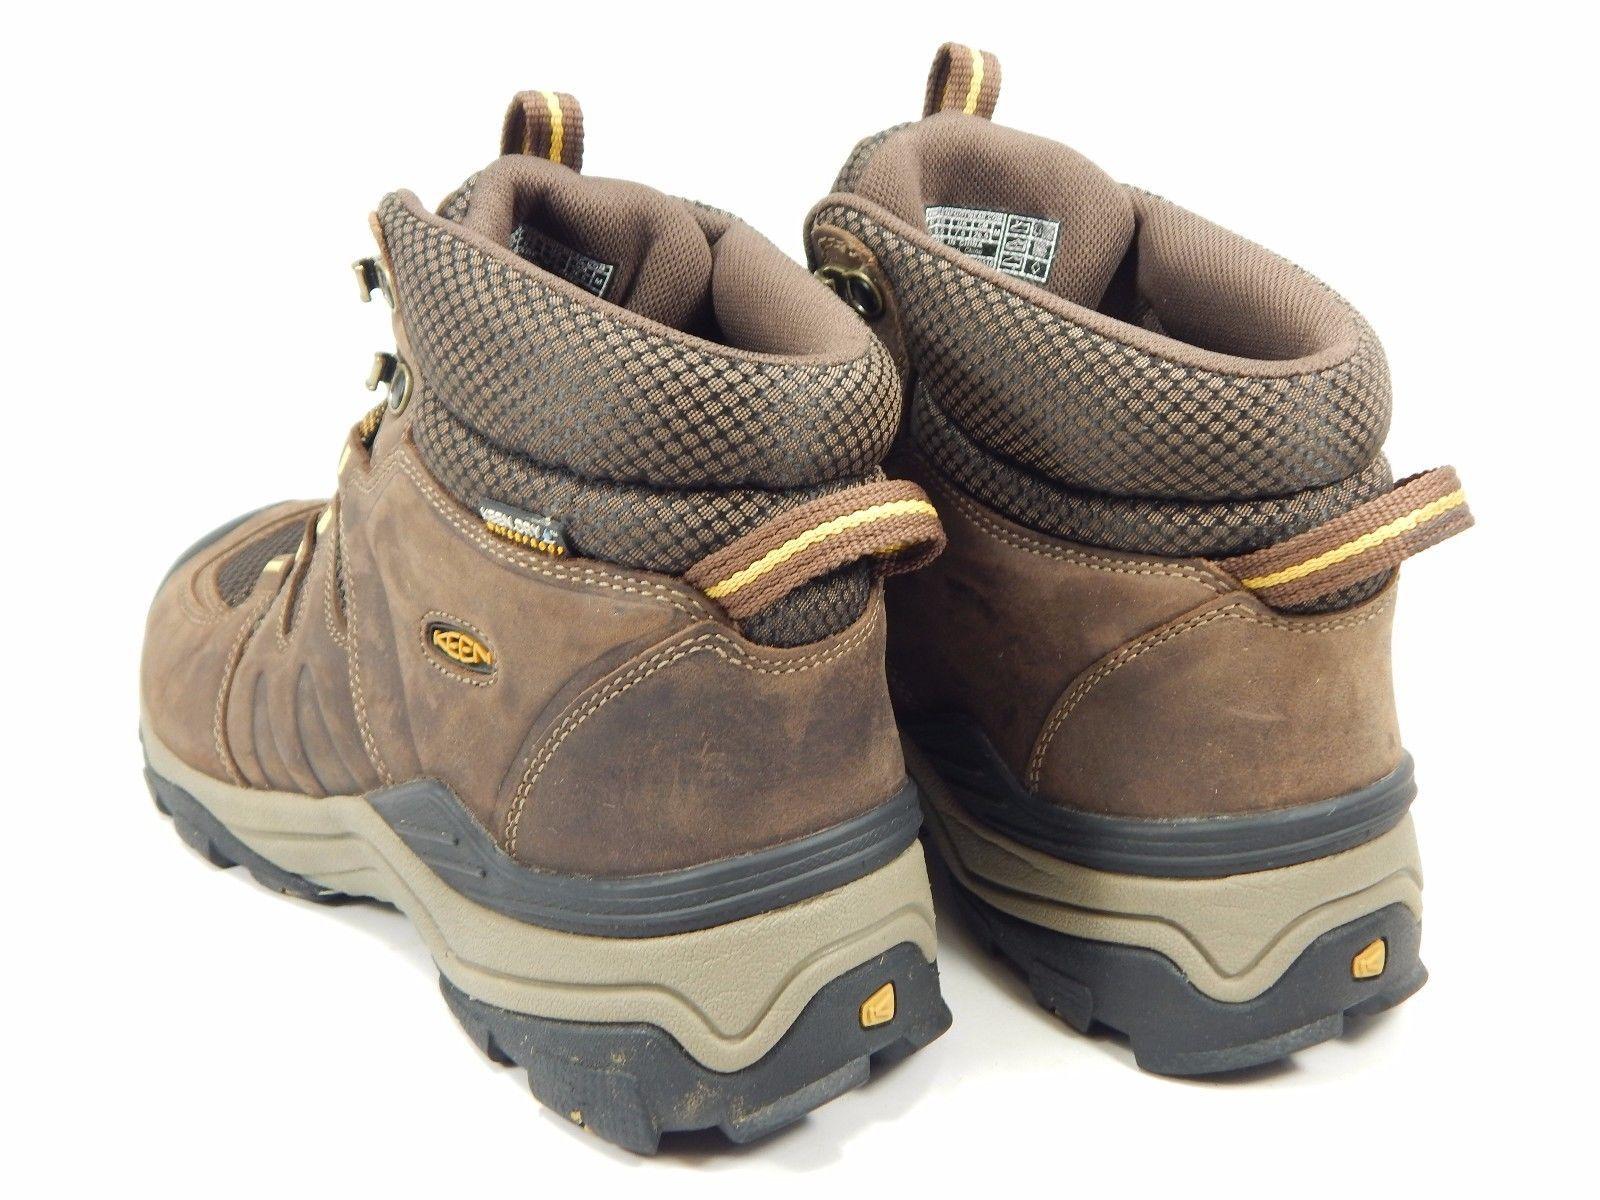 Keen Gypsum II Mid Men's Waterproof Hiking Shoes Size US 8.5 M (D) EU 41 Brown